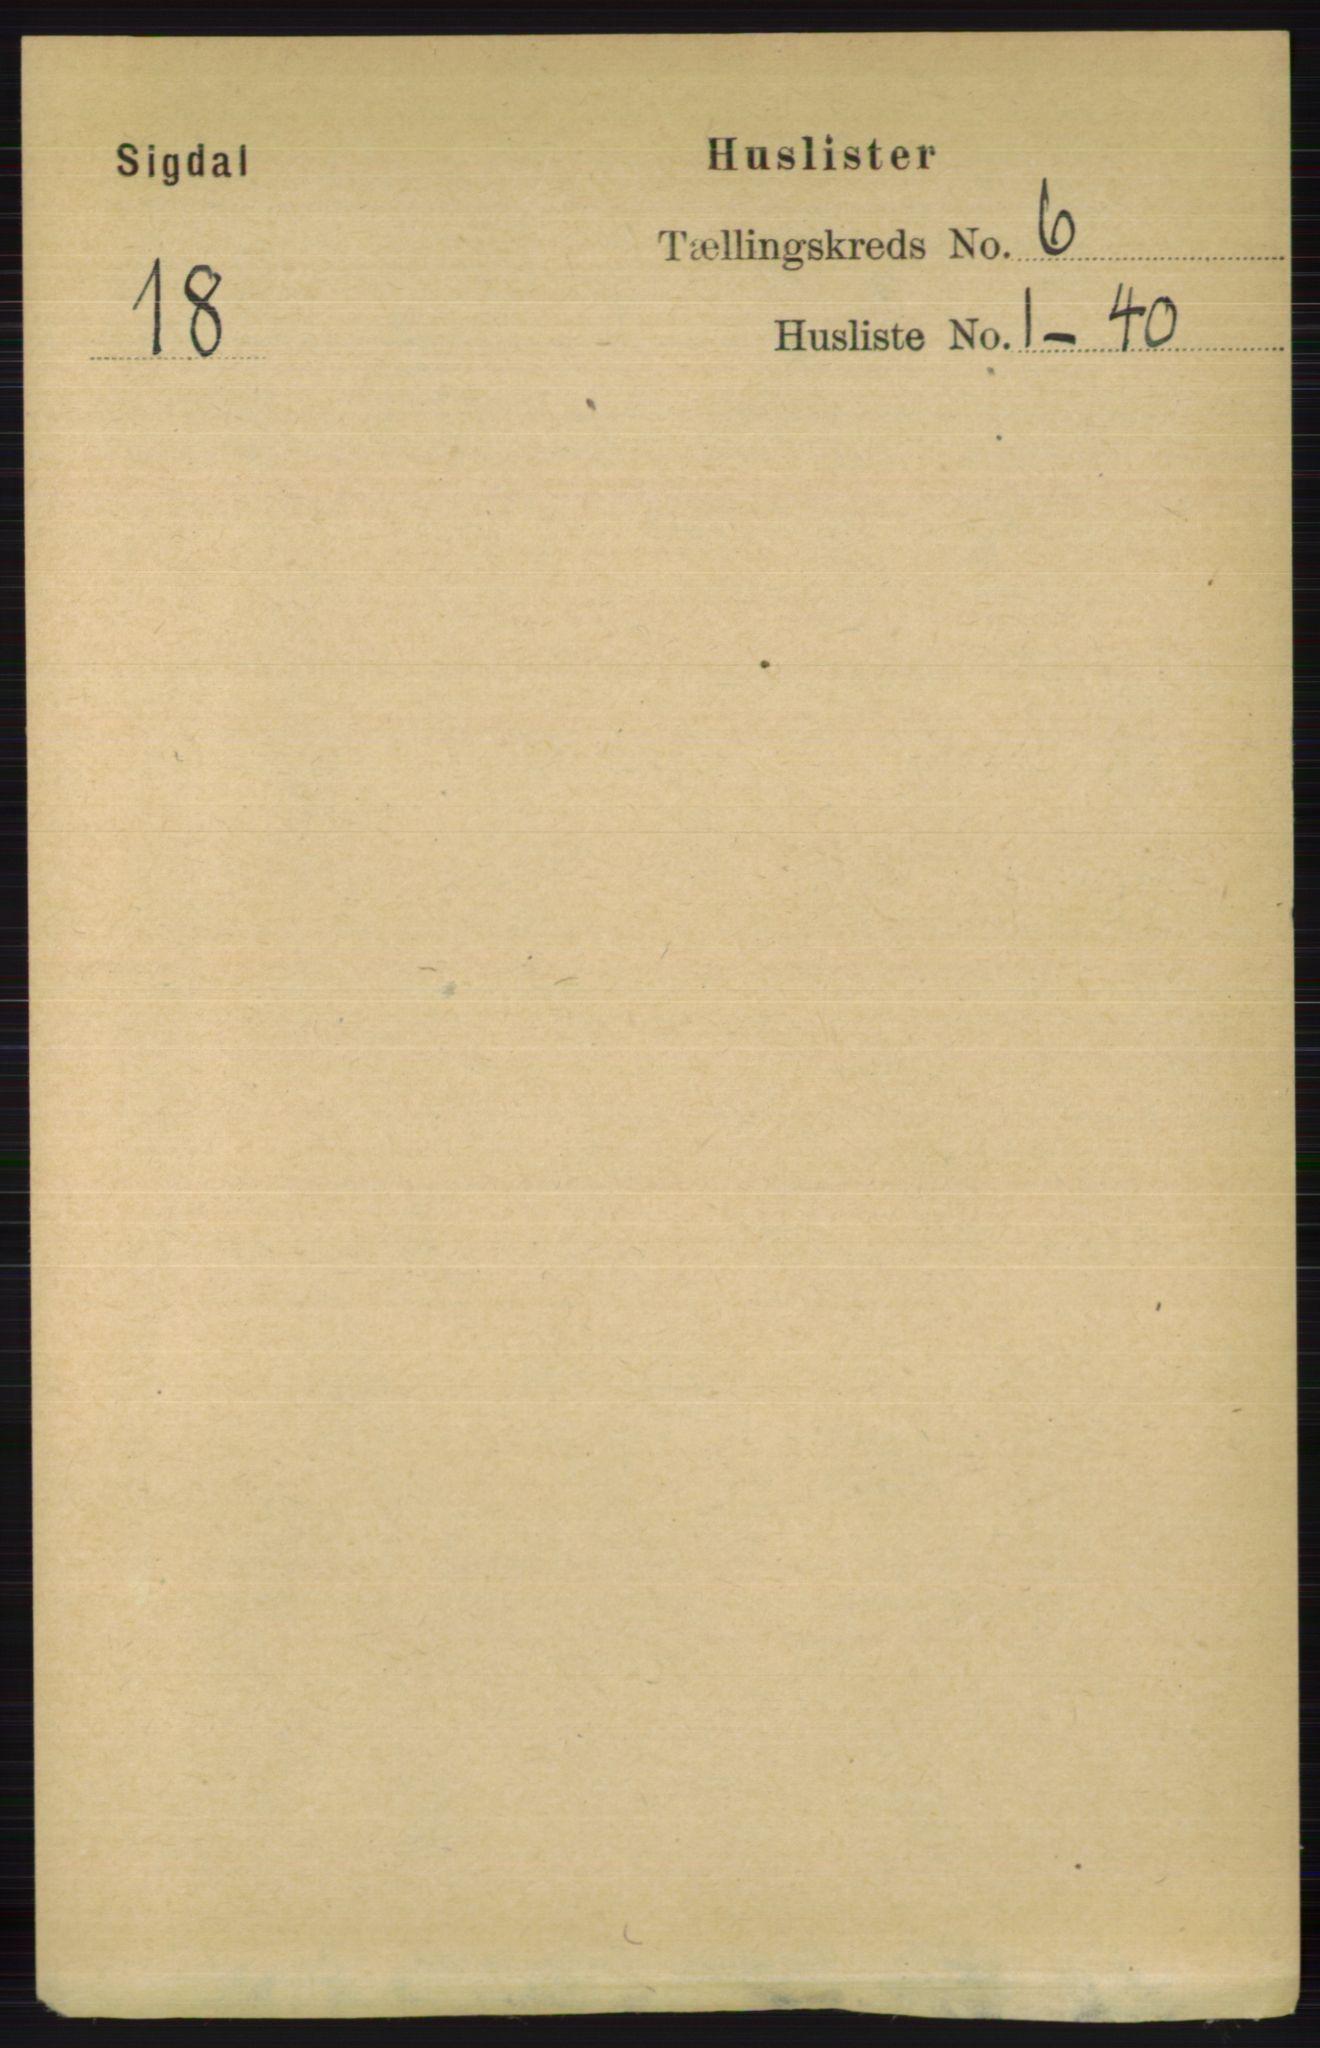 RA, Folketelling 1891 for 0621 Sigdal herred, 1891, s. 2380